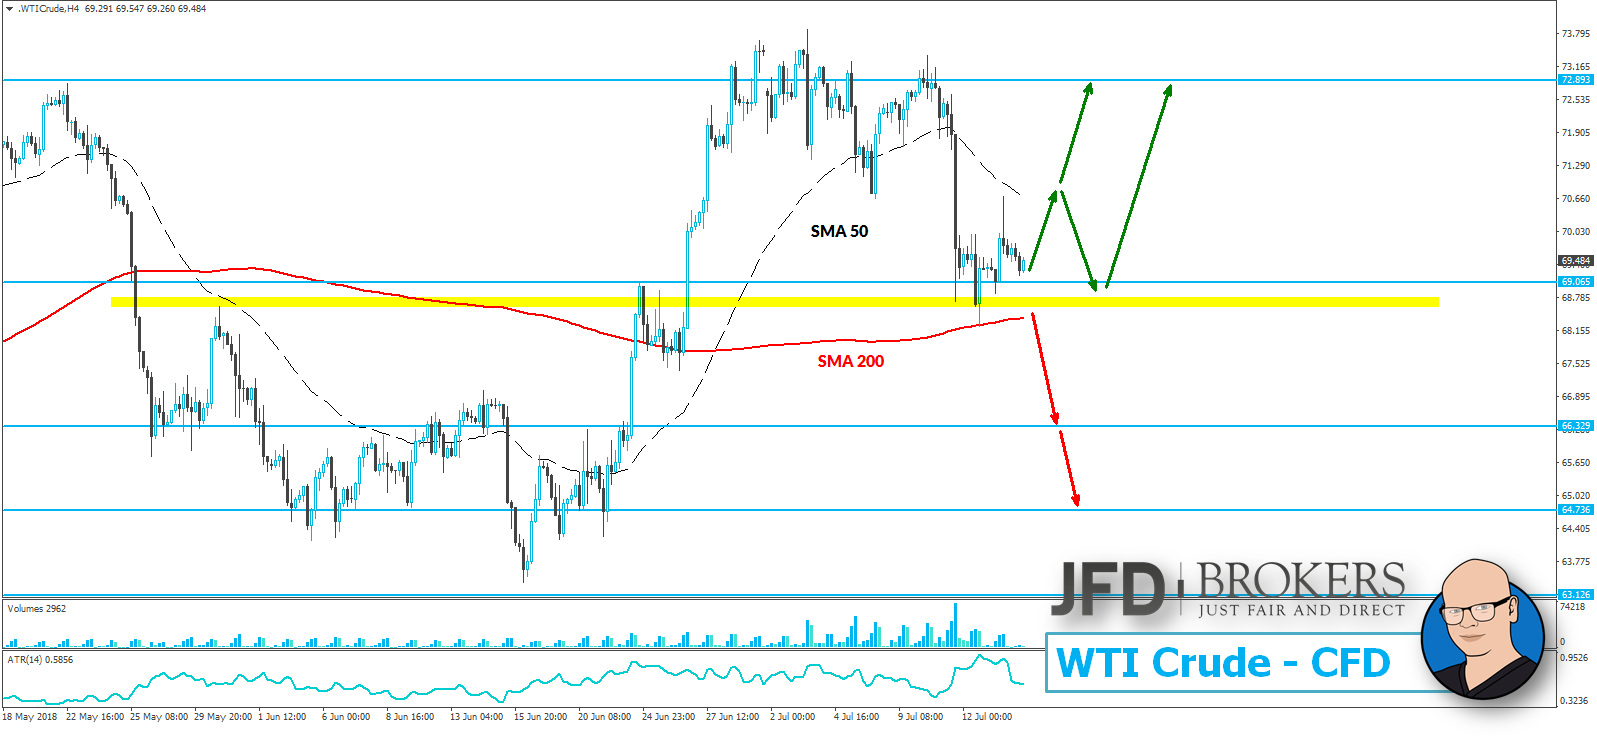 JFD-Wochenausblick-EUR-USD-GBP-USD-DAX-und-WTI-16-07-2018-20-07-2018-Kommentar-JFD-Brokers-GodmodeTrader.de-4